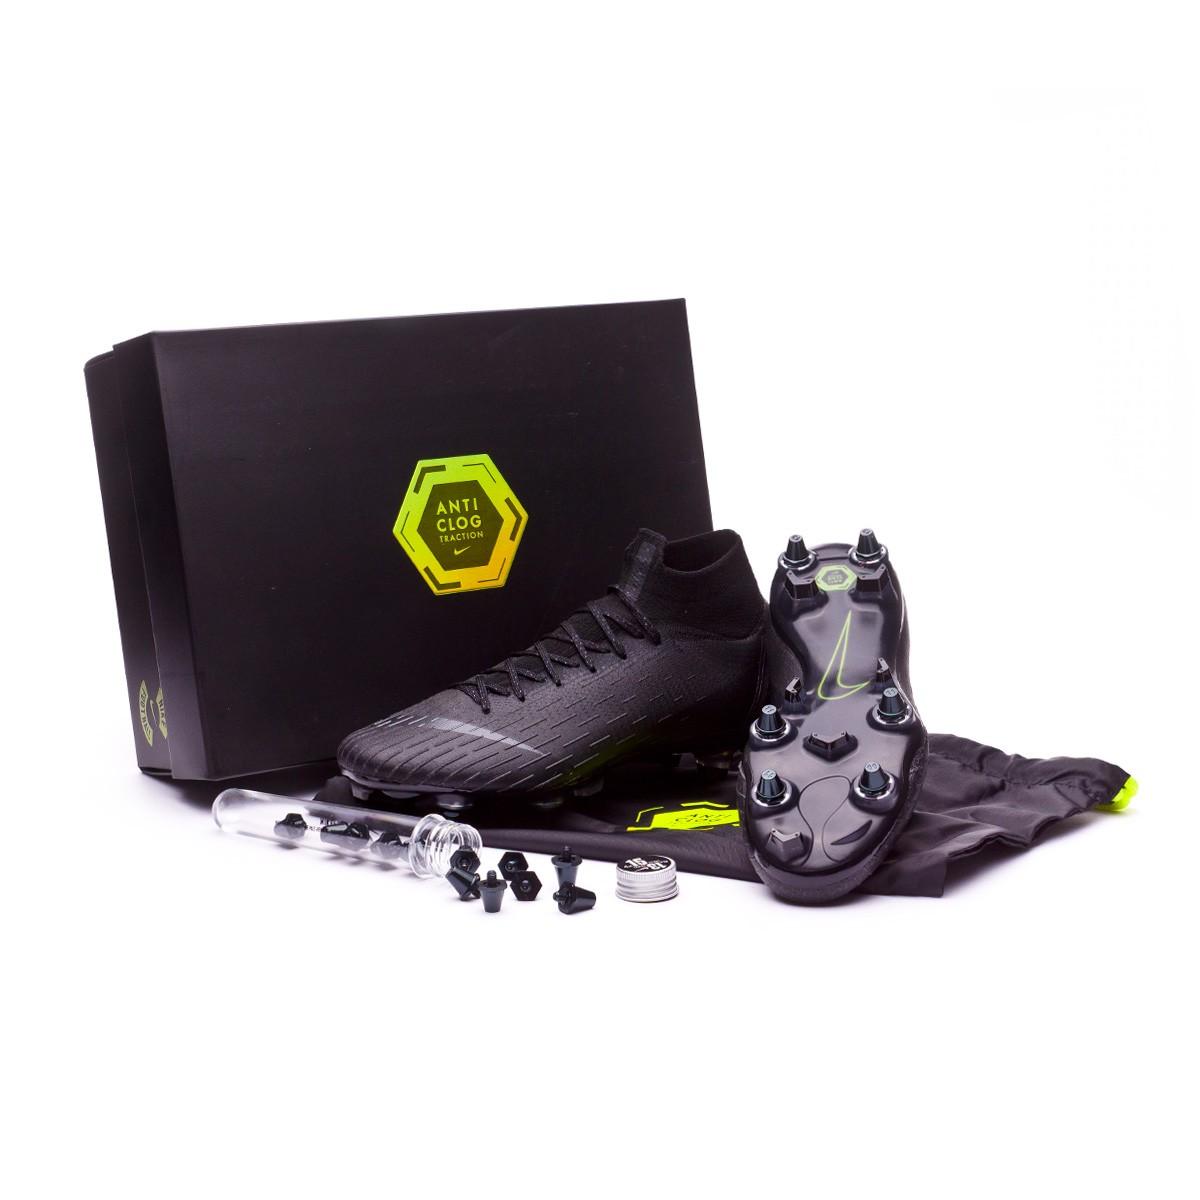 sneakers for cheap 65122 7260a Bota Mercurial Superfly VI Elite Anti-Clog SG-Pro Black